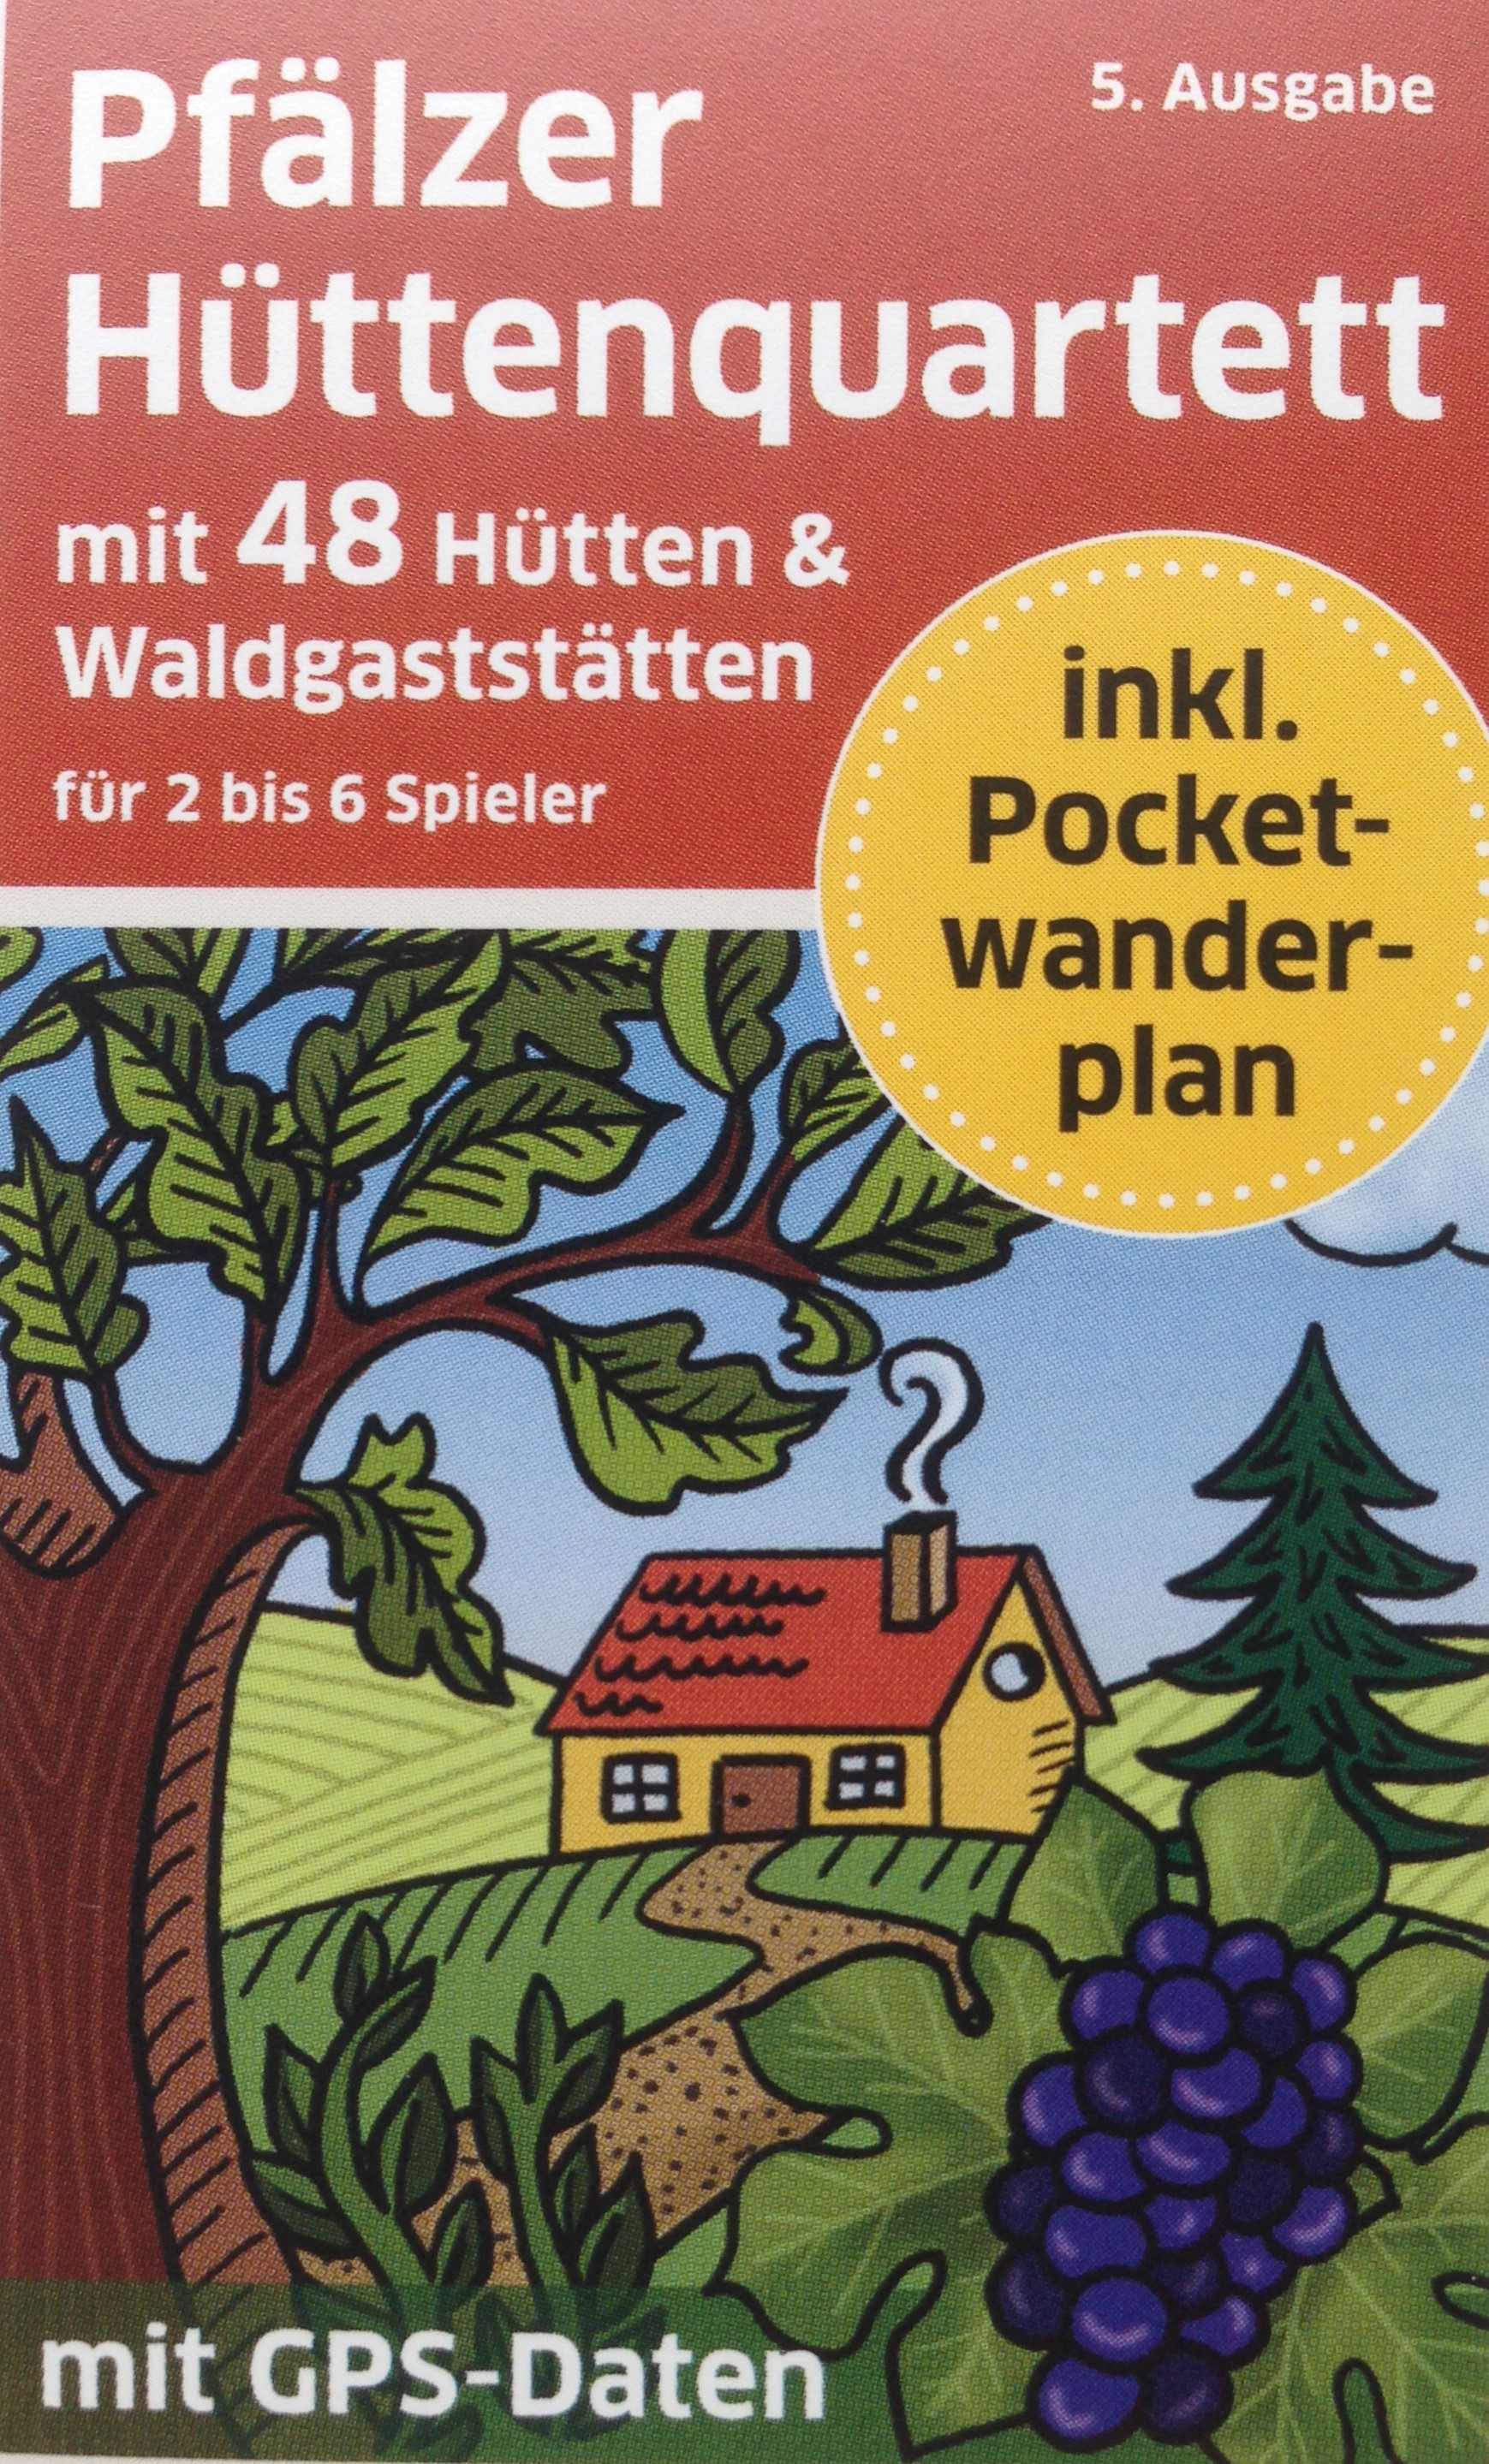 Pfälzer_Hüttenquartett_Kartenspiel